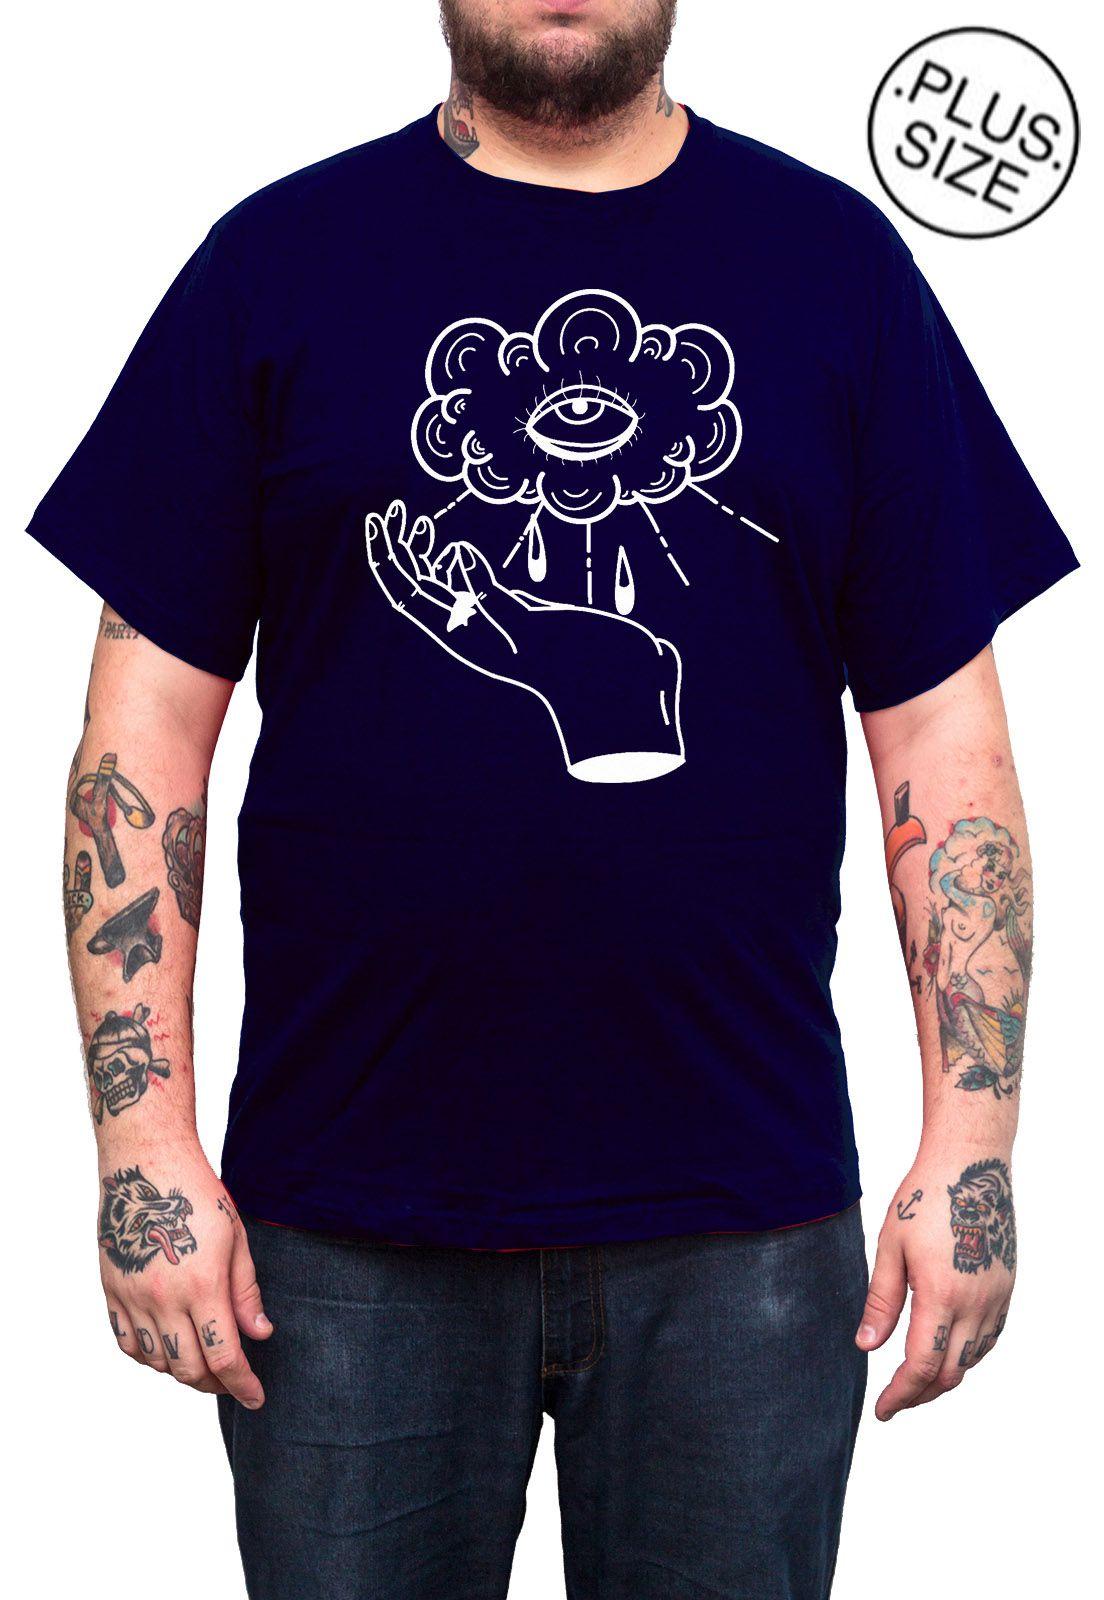 Camiseta Hshop Can See U - Azul Marinho - Plus Size - Tamanho Grande XG  - HShop